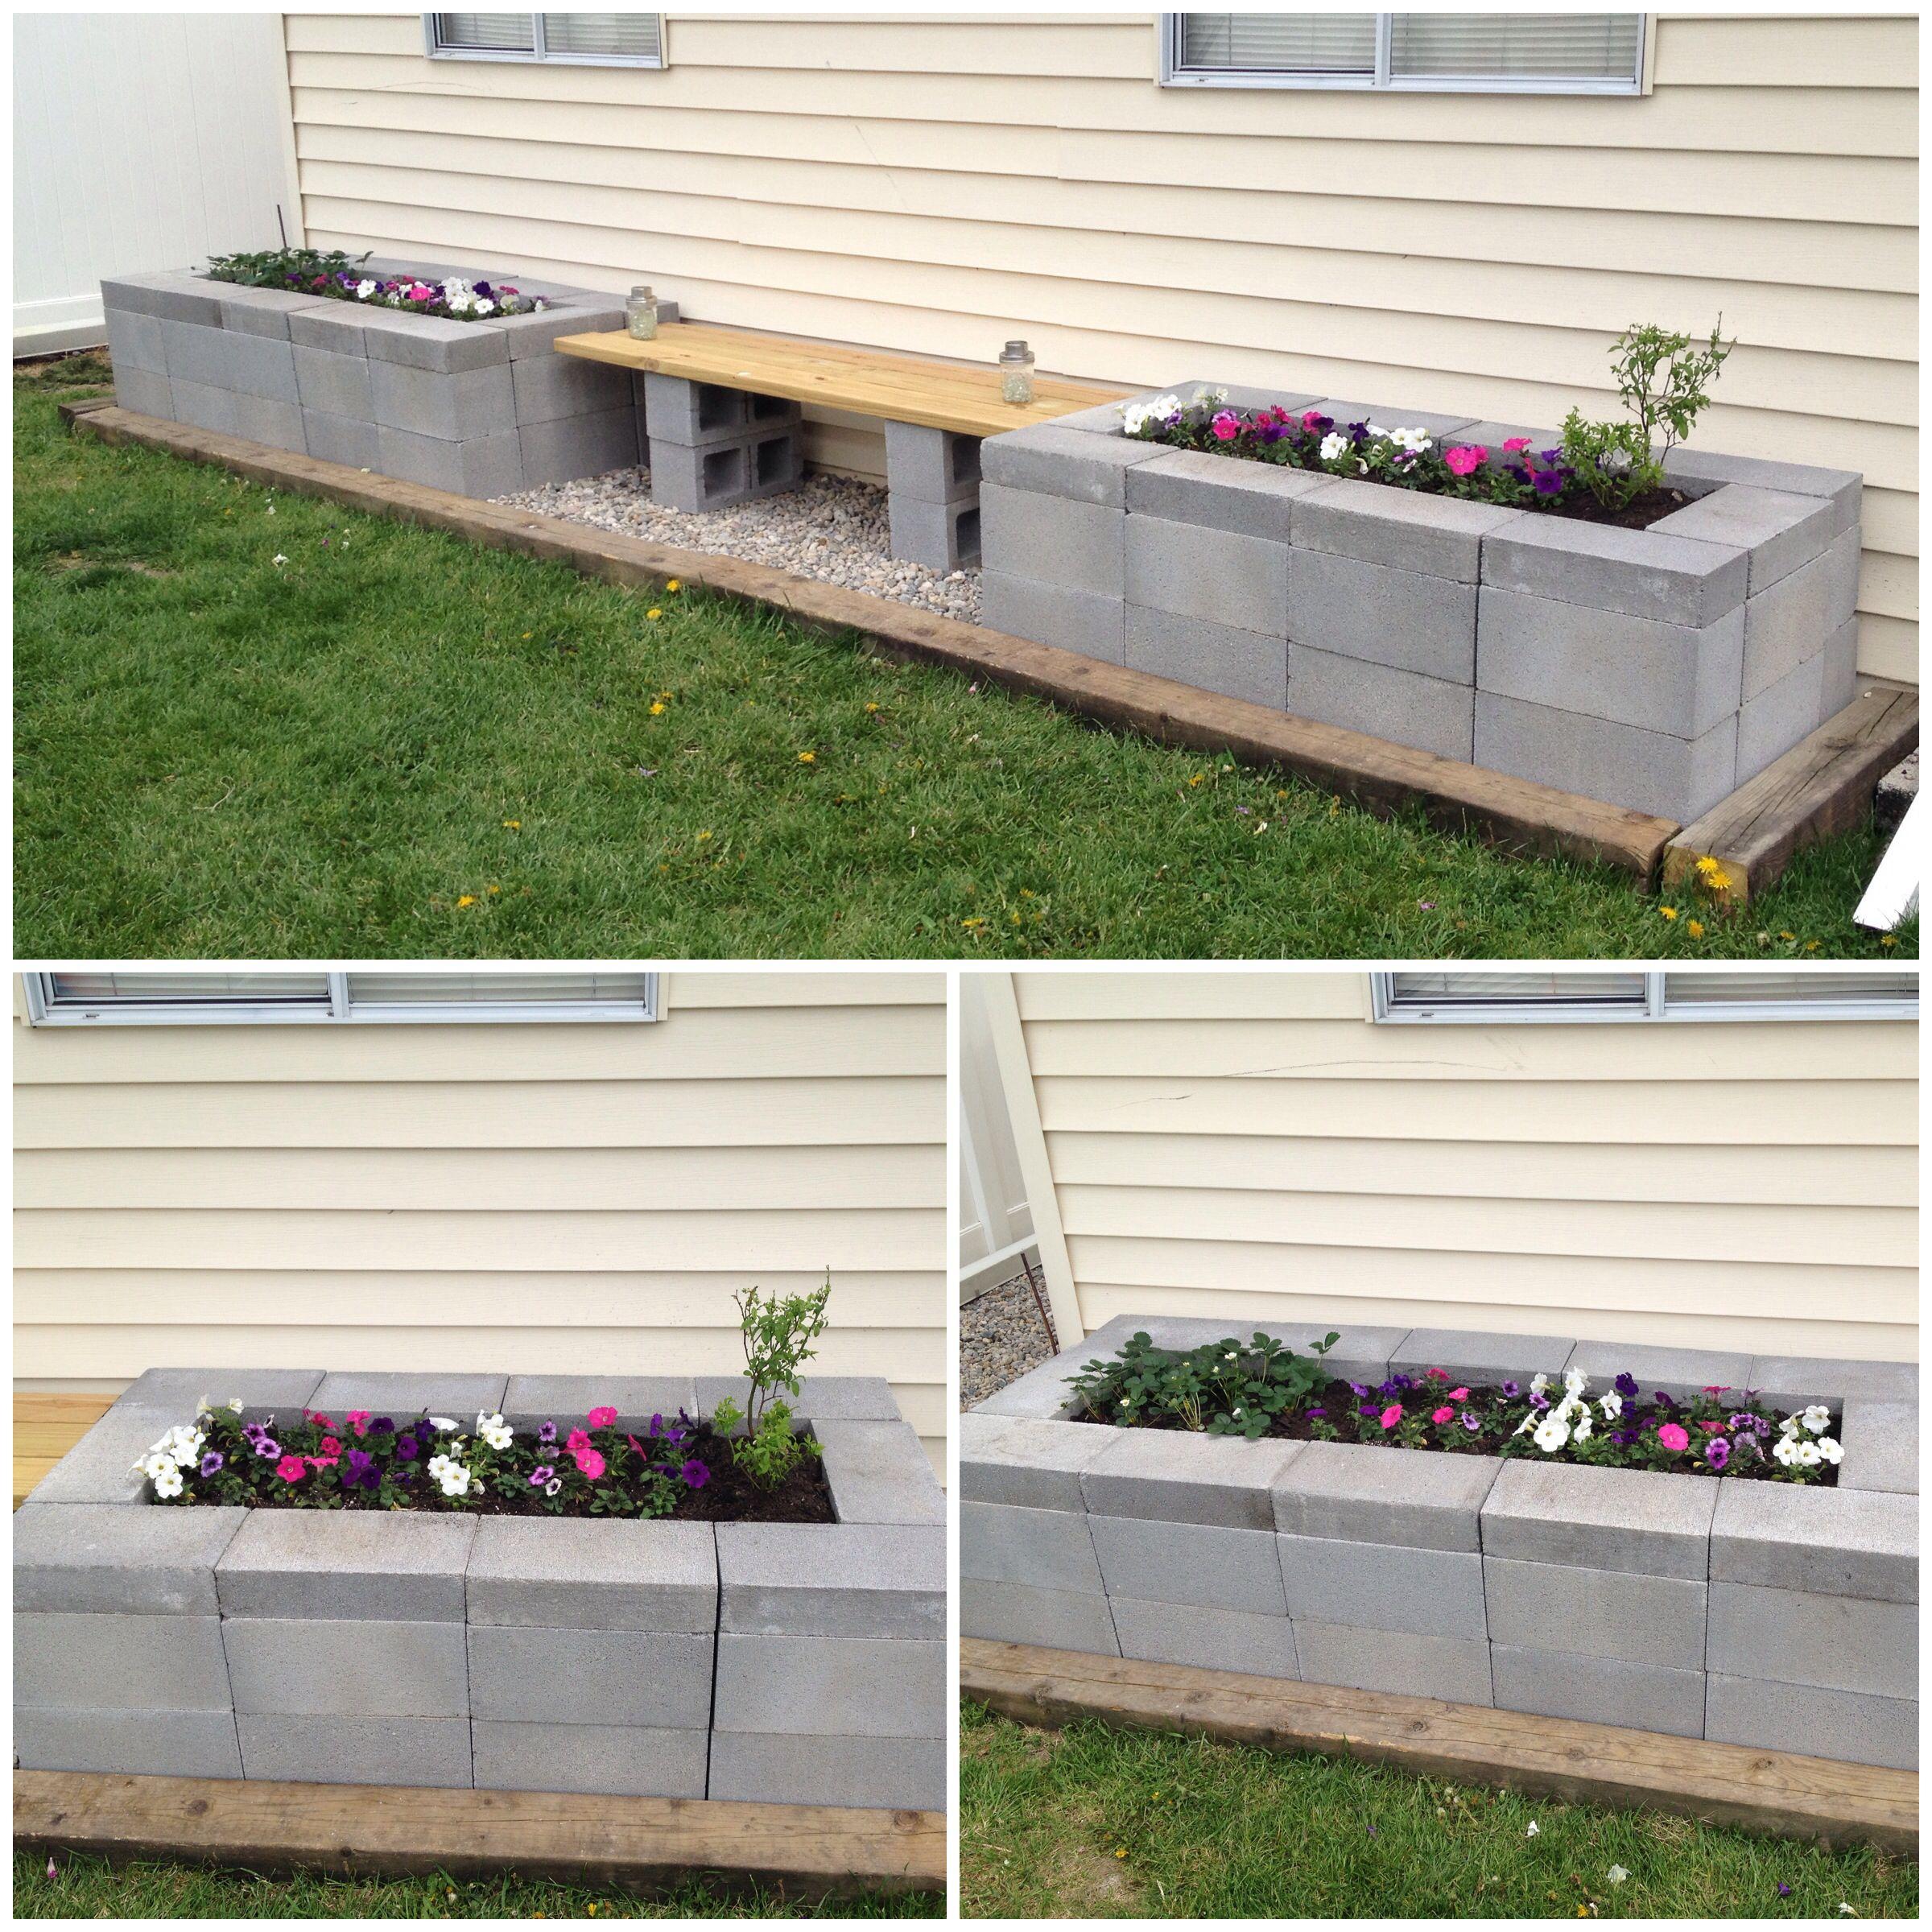 Concrete Block Garden Bed: Cinder Block Raised Garden Bed With Bench